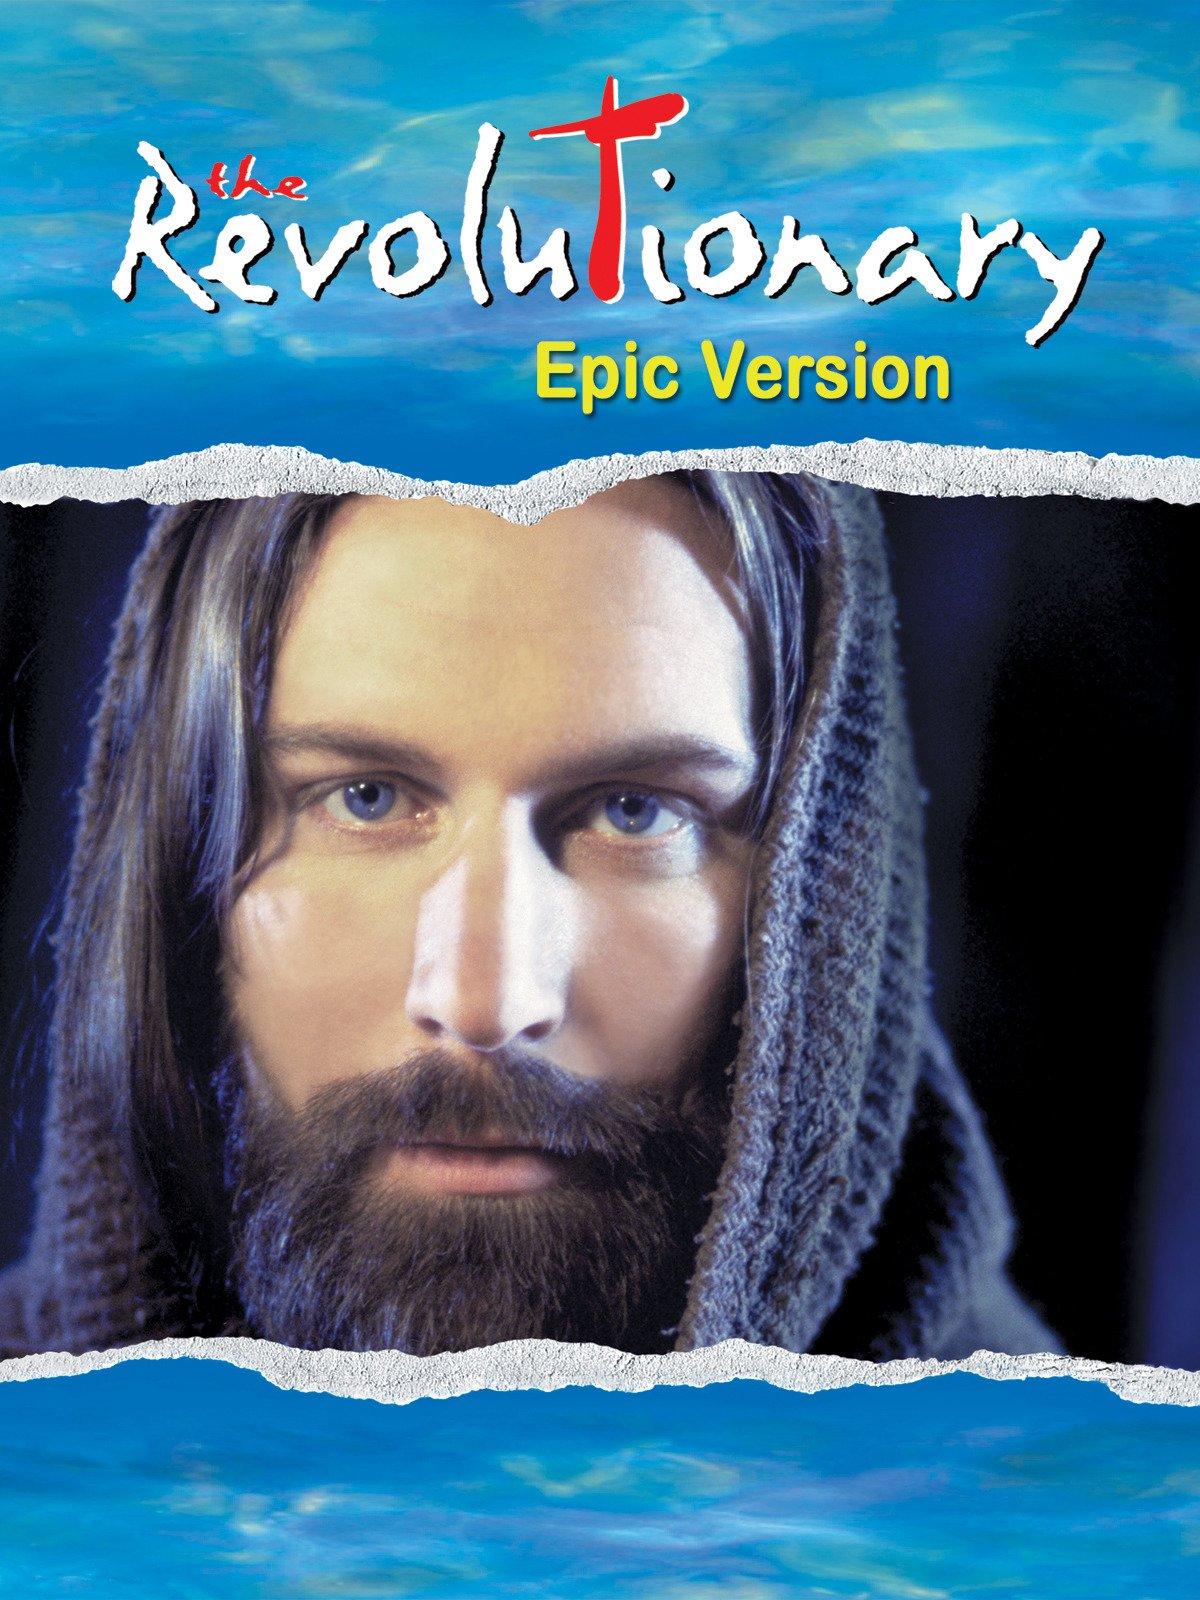 Revolutionary Epic